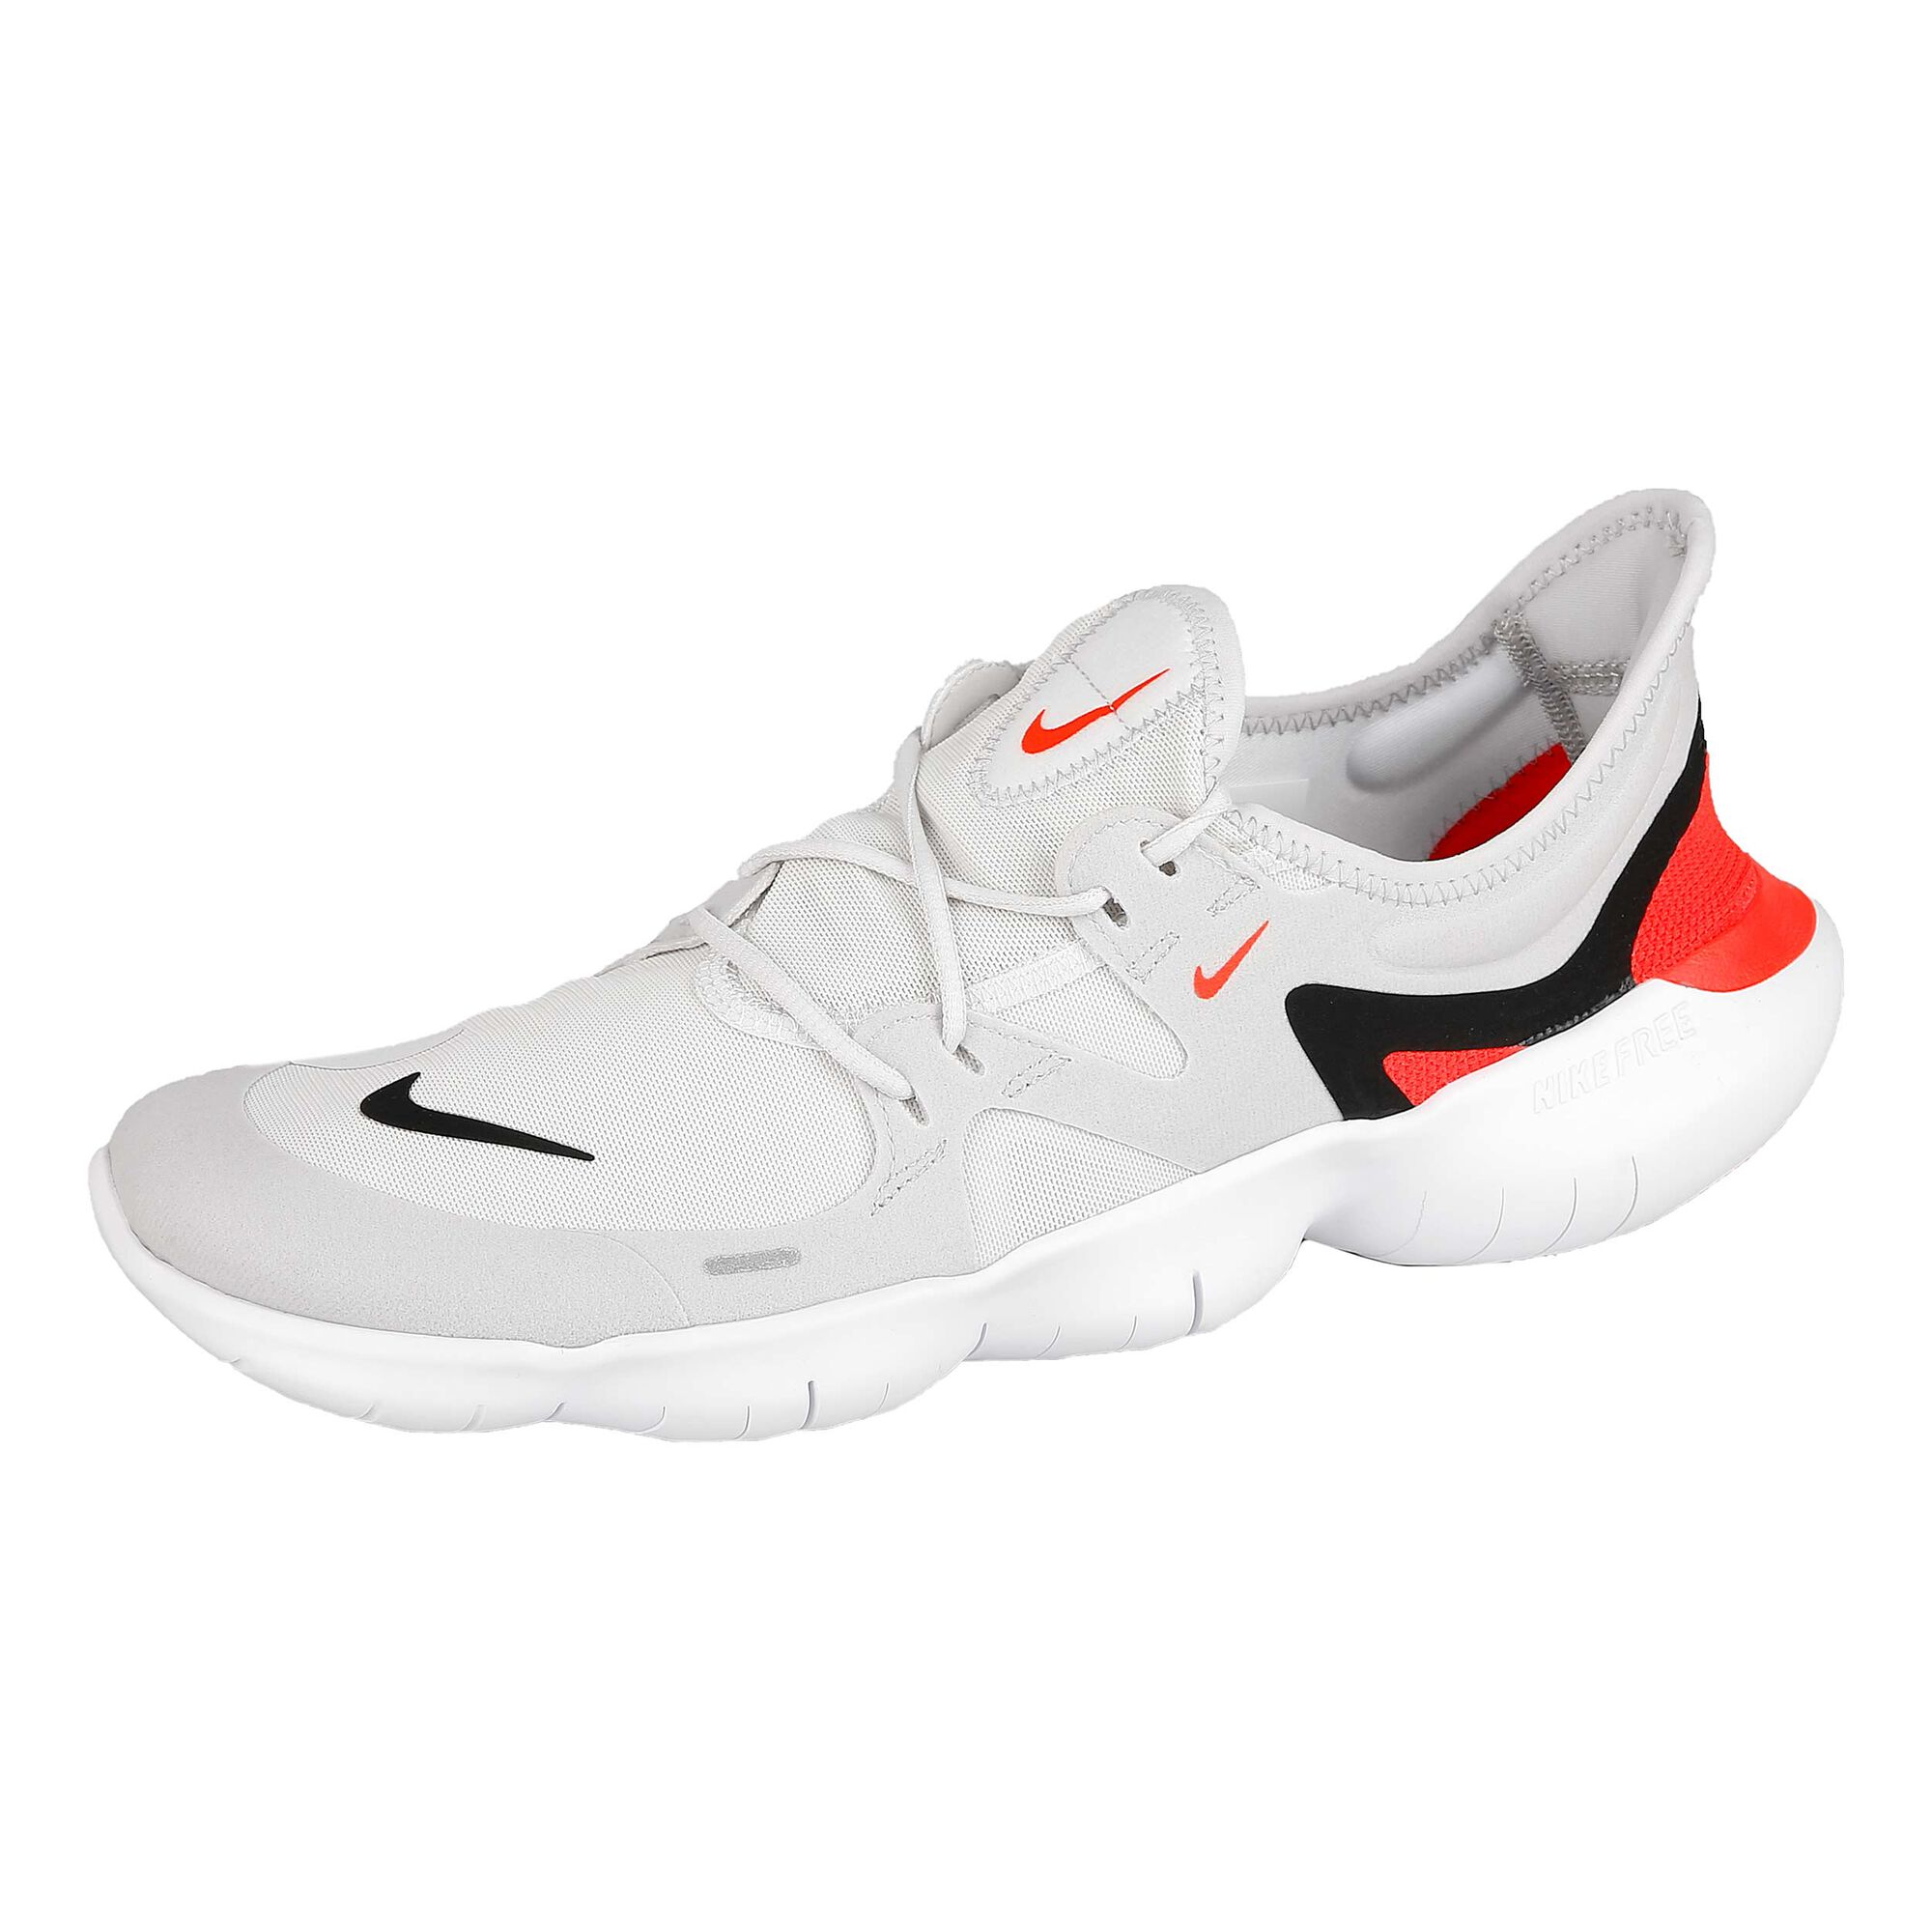 huge discount 99a21 d5d1d Nike Free 5.0 Natural Running Shoe Men - White, Black